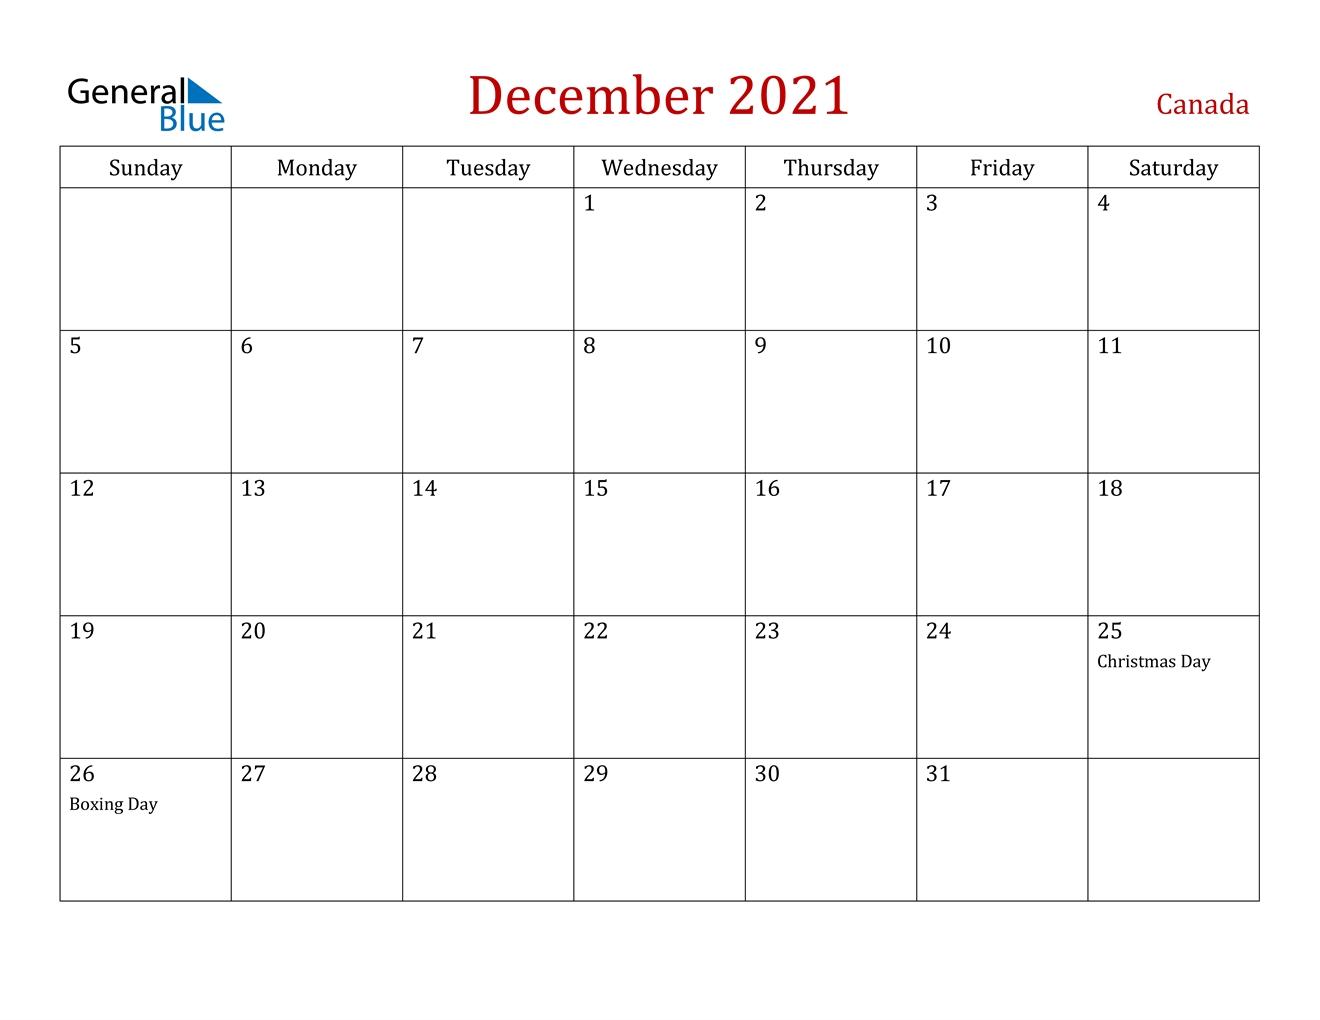 December 2021 Calendar - Canada